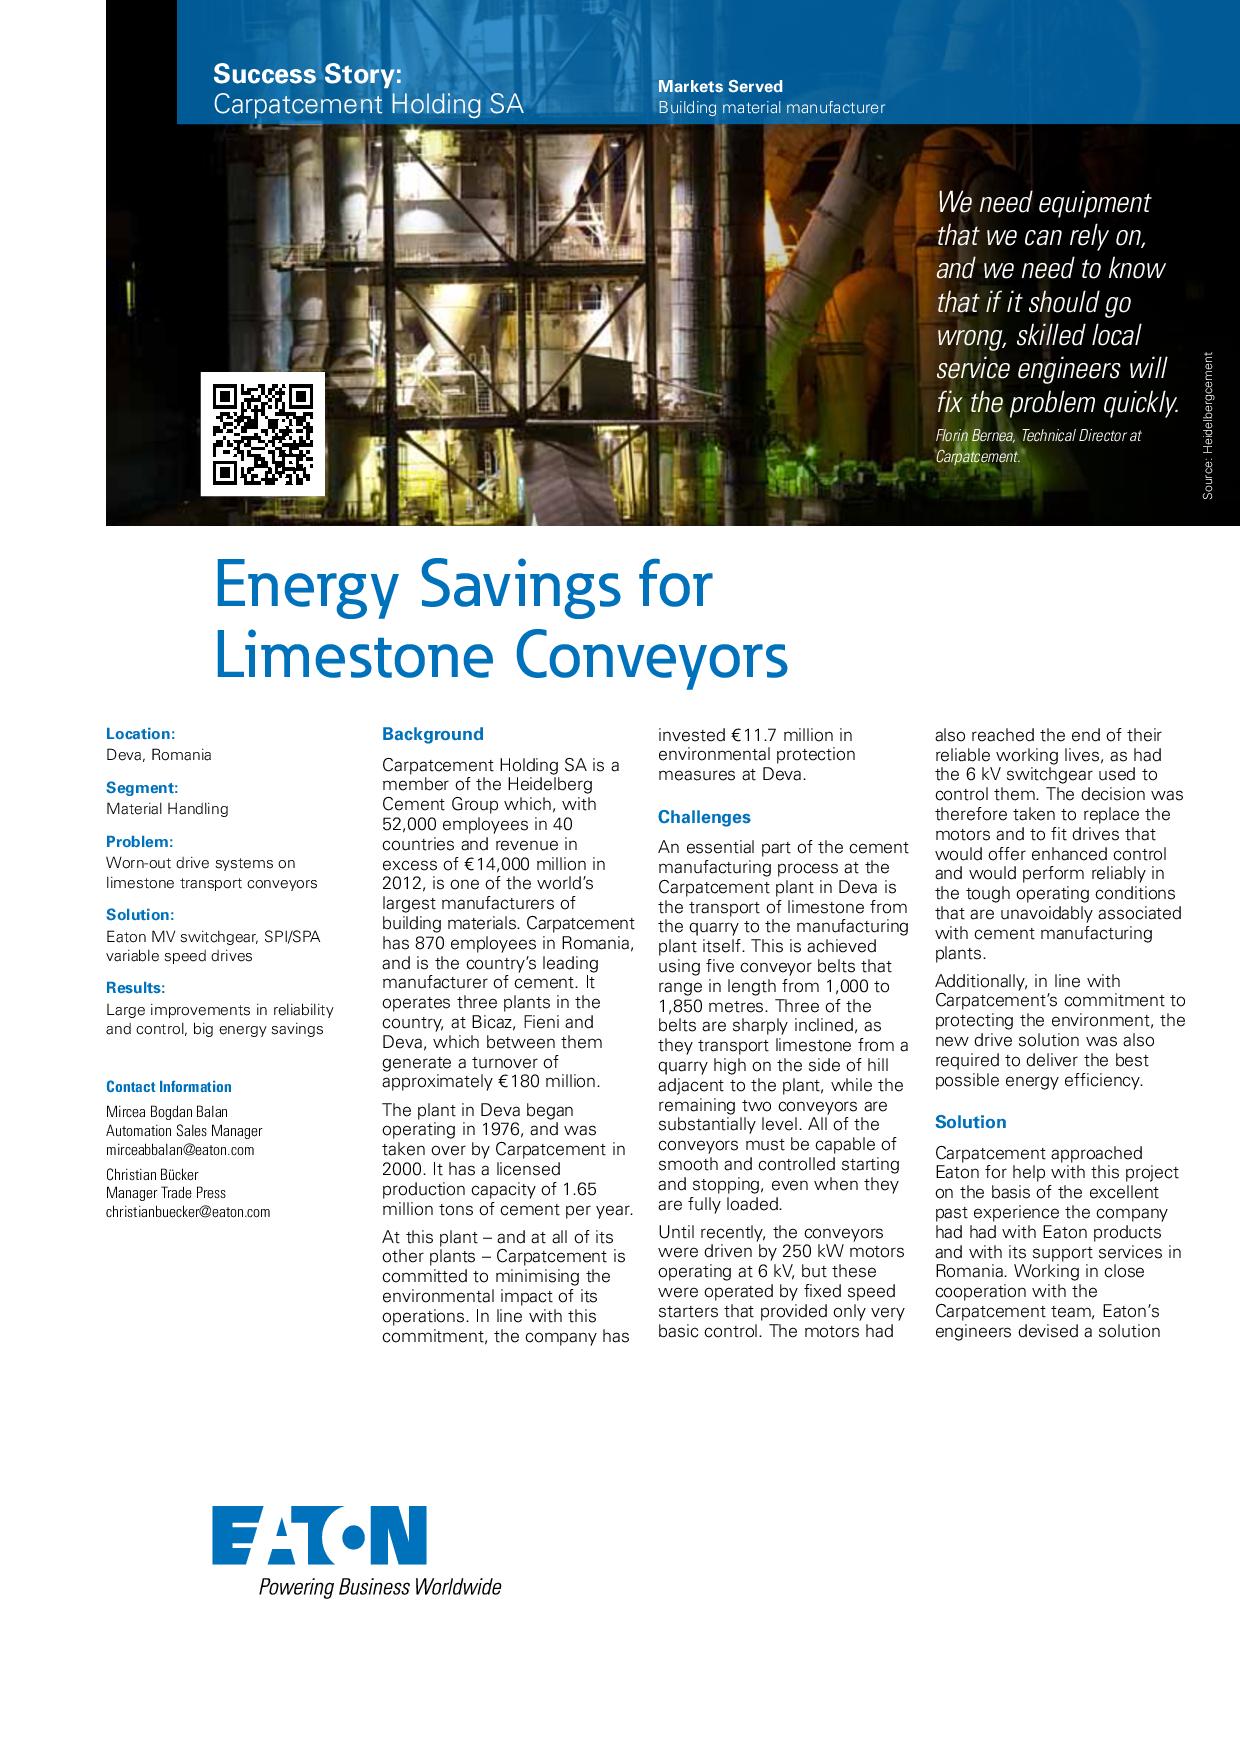 Energy Savings for Limestone Conveyors